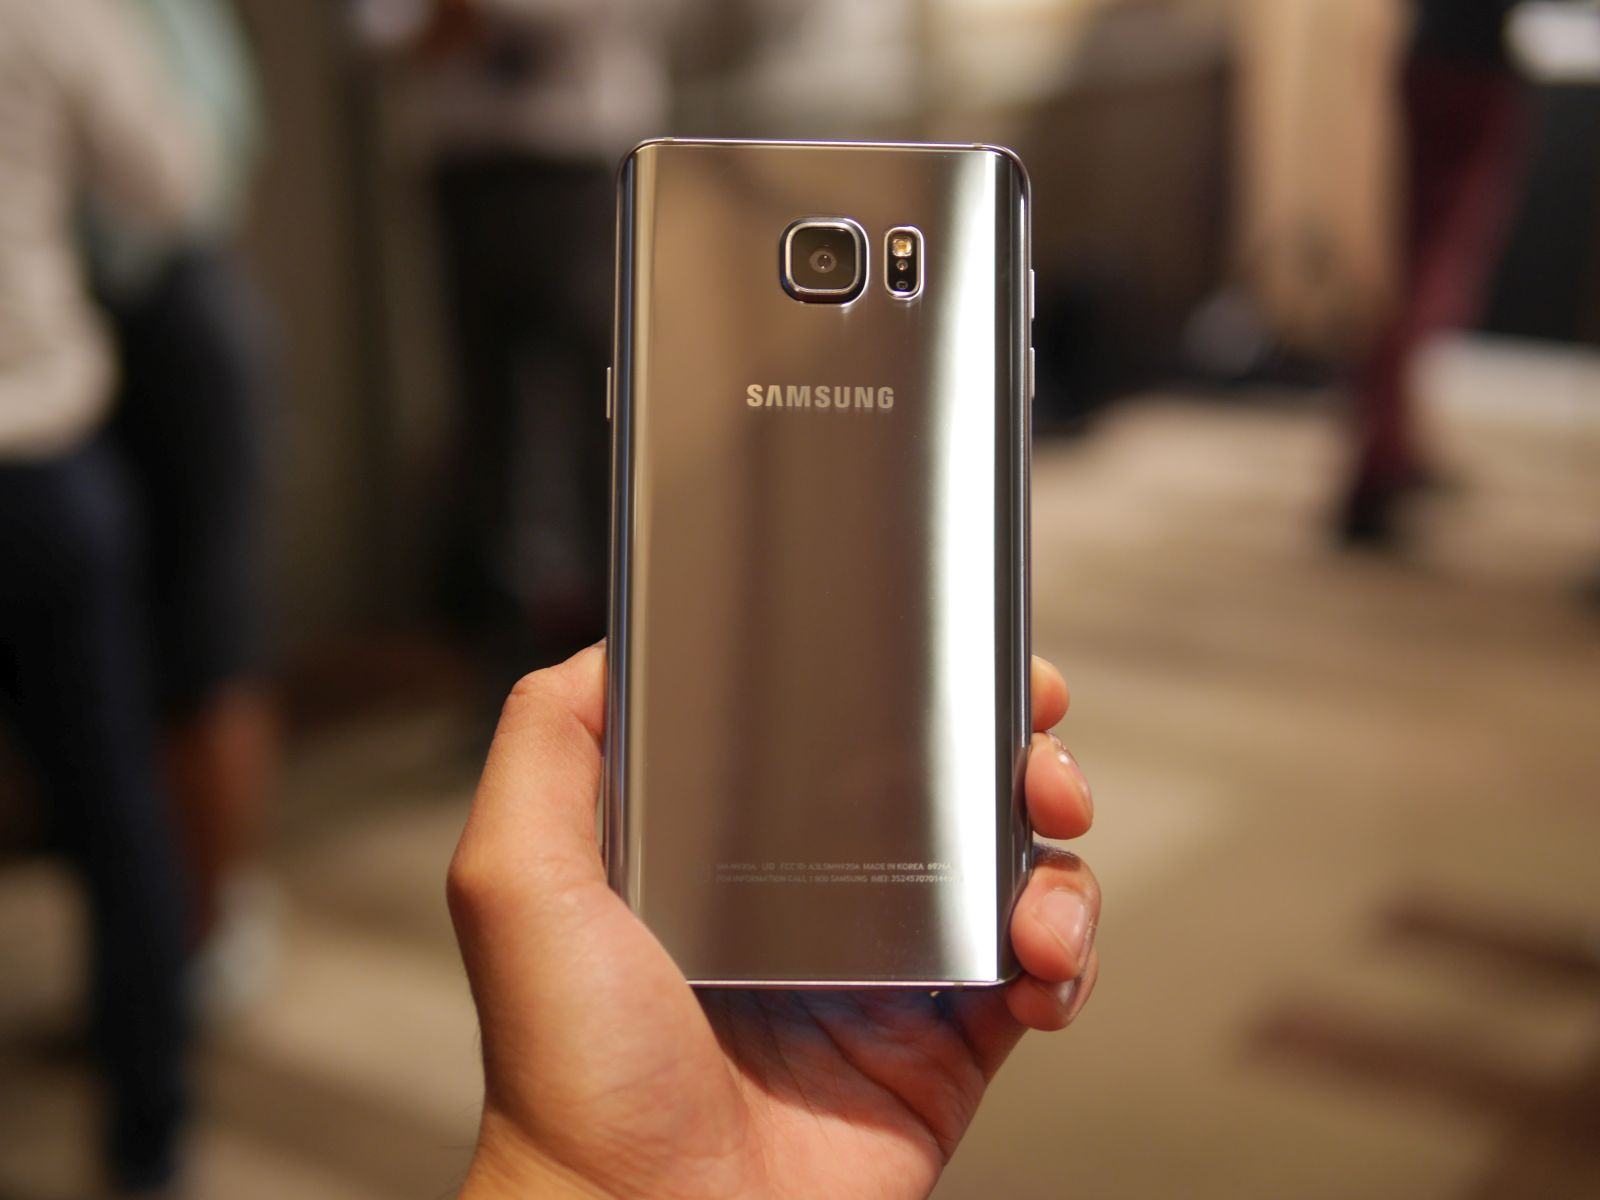 Samsung Galaxy S6 edge Plus 12